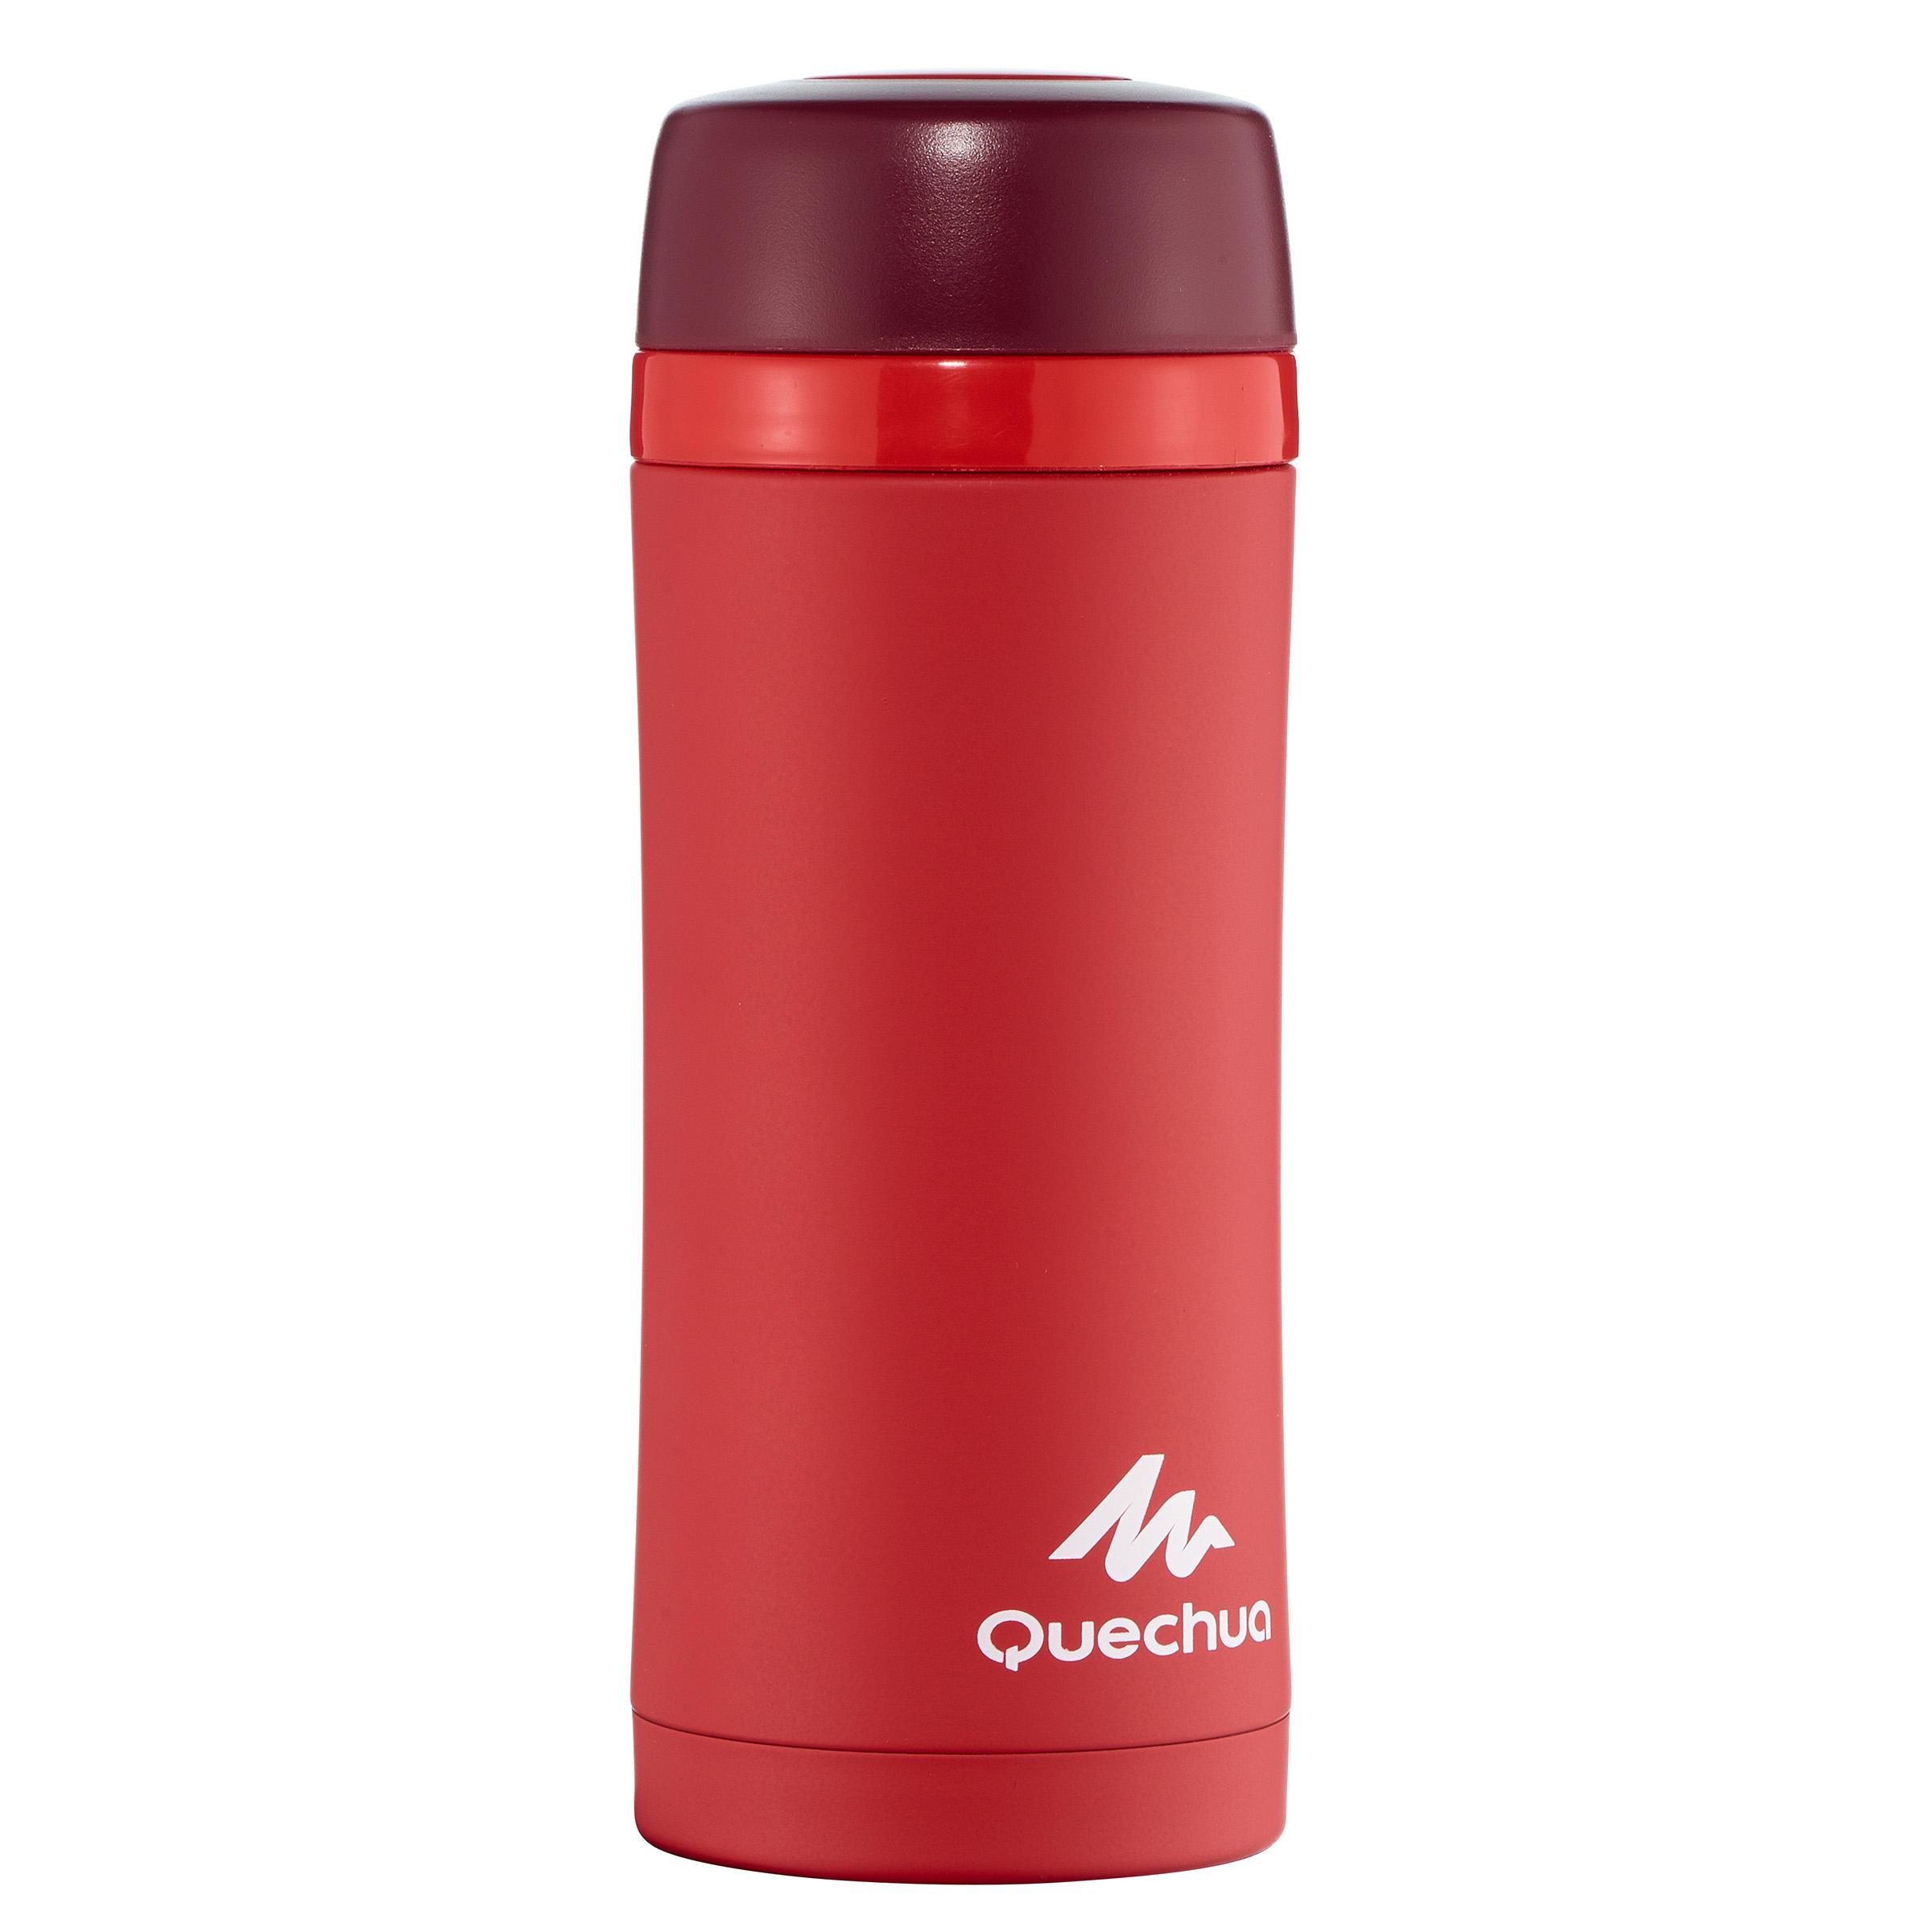 Isotherme Mug 0 Litre 35 Randonnée Inox Noir cRAjL354qS